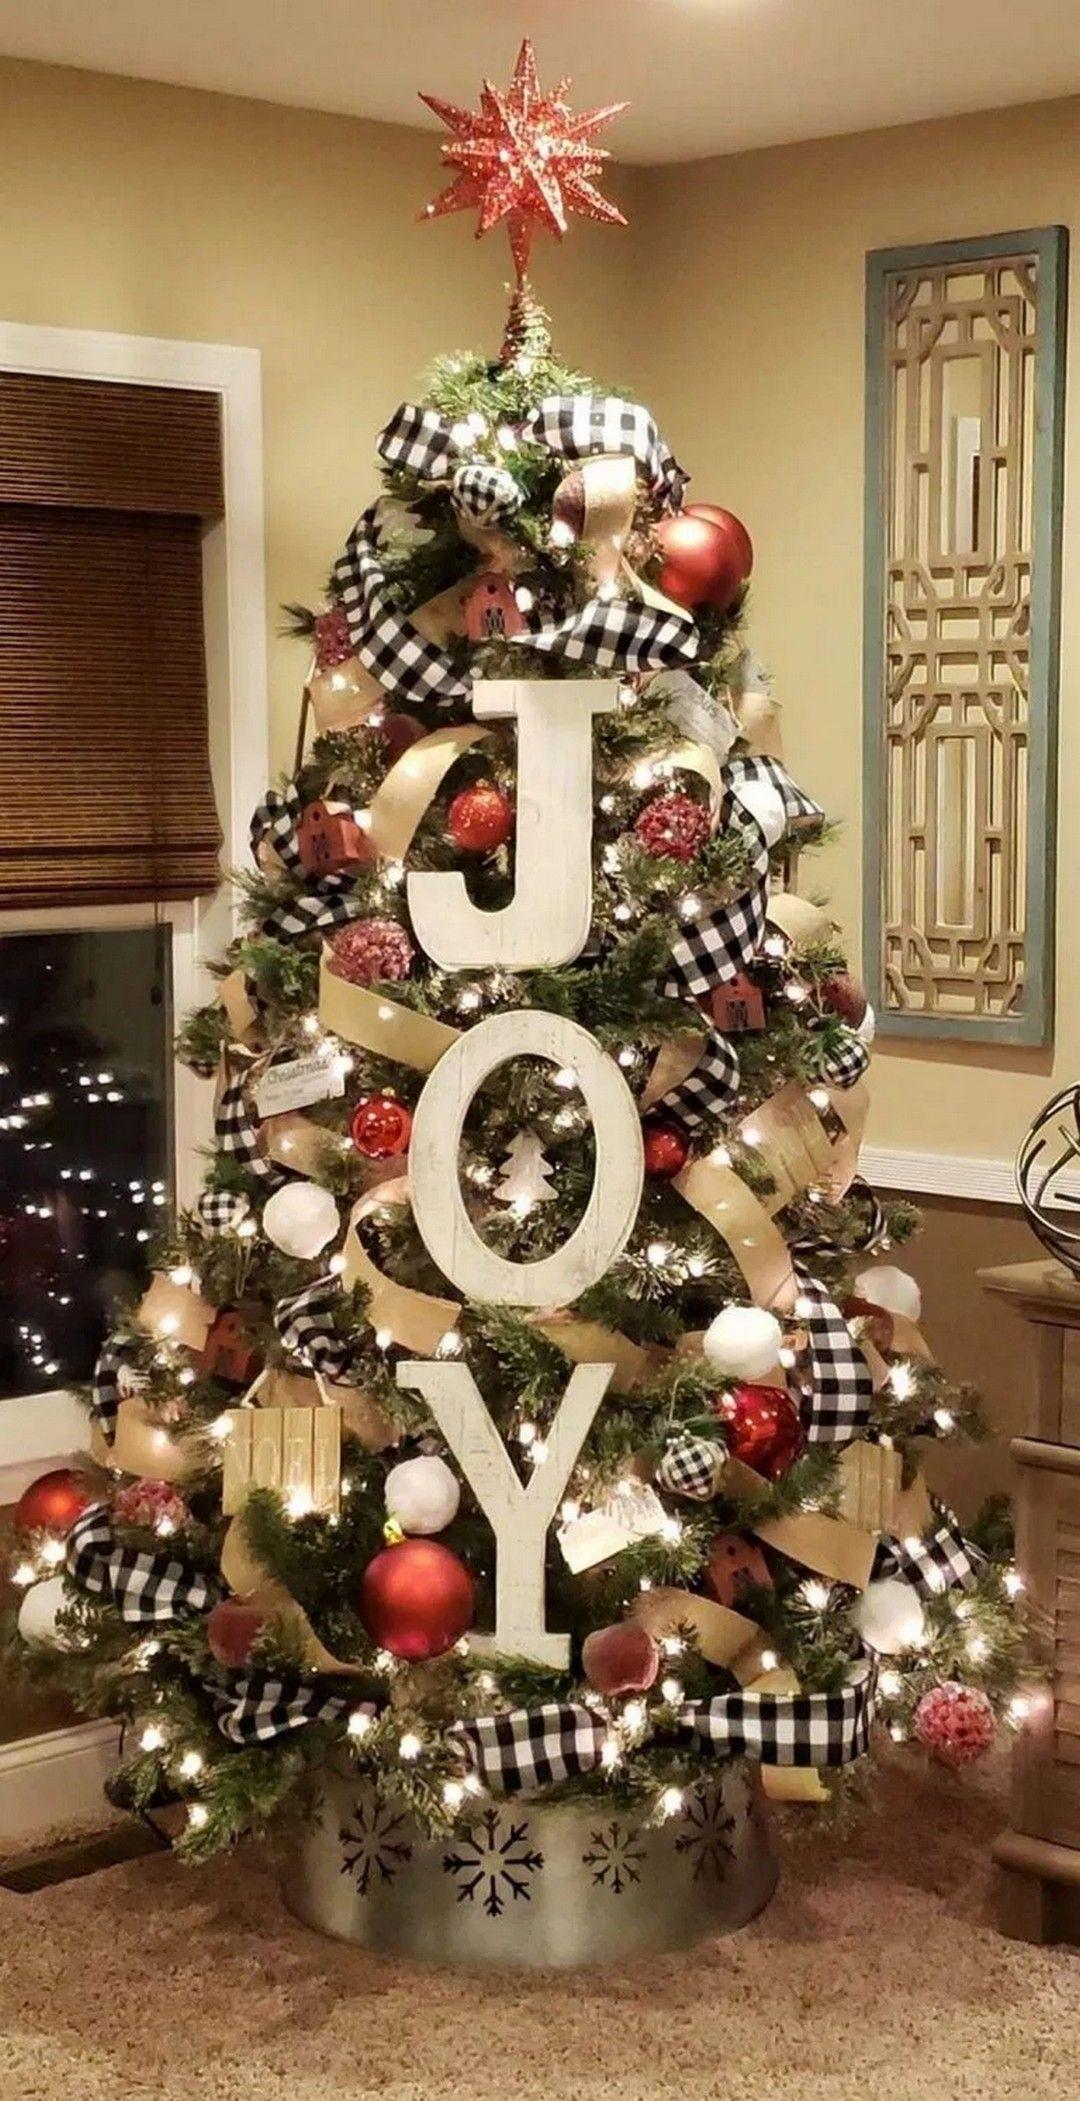 Farmhouse Christmas Decor And Decorating Ideas Christmas Tree Decorations Diy Christmas Tree Crafts Christmas Tree Inspiration